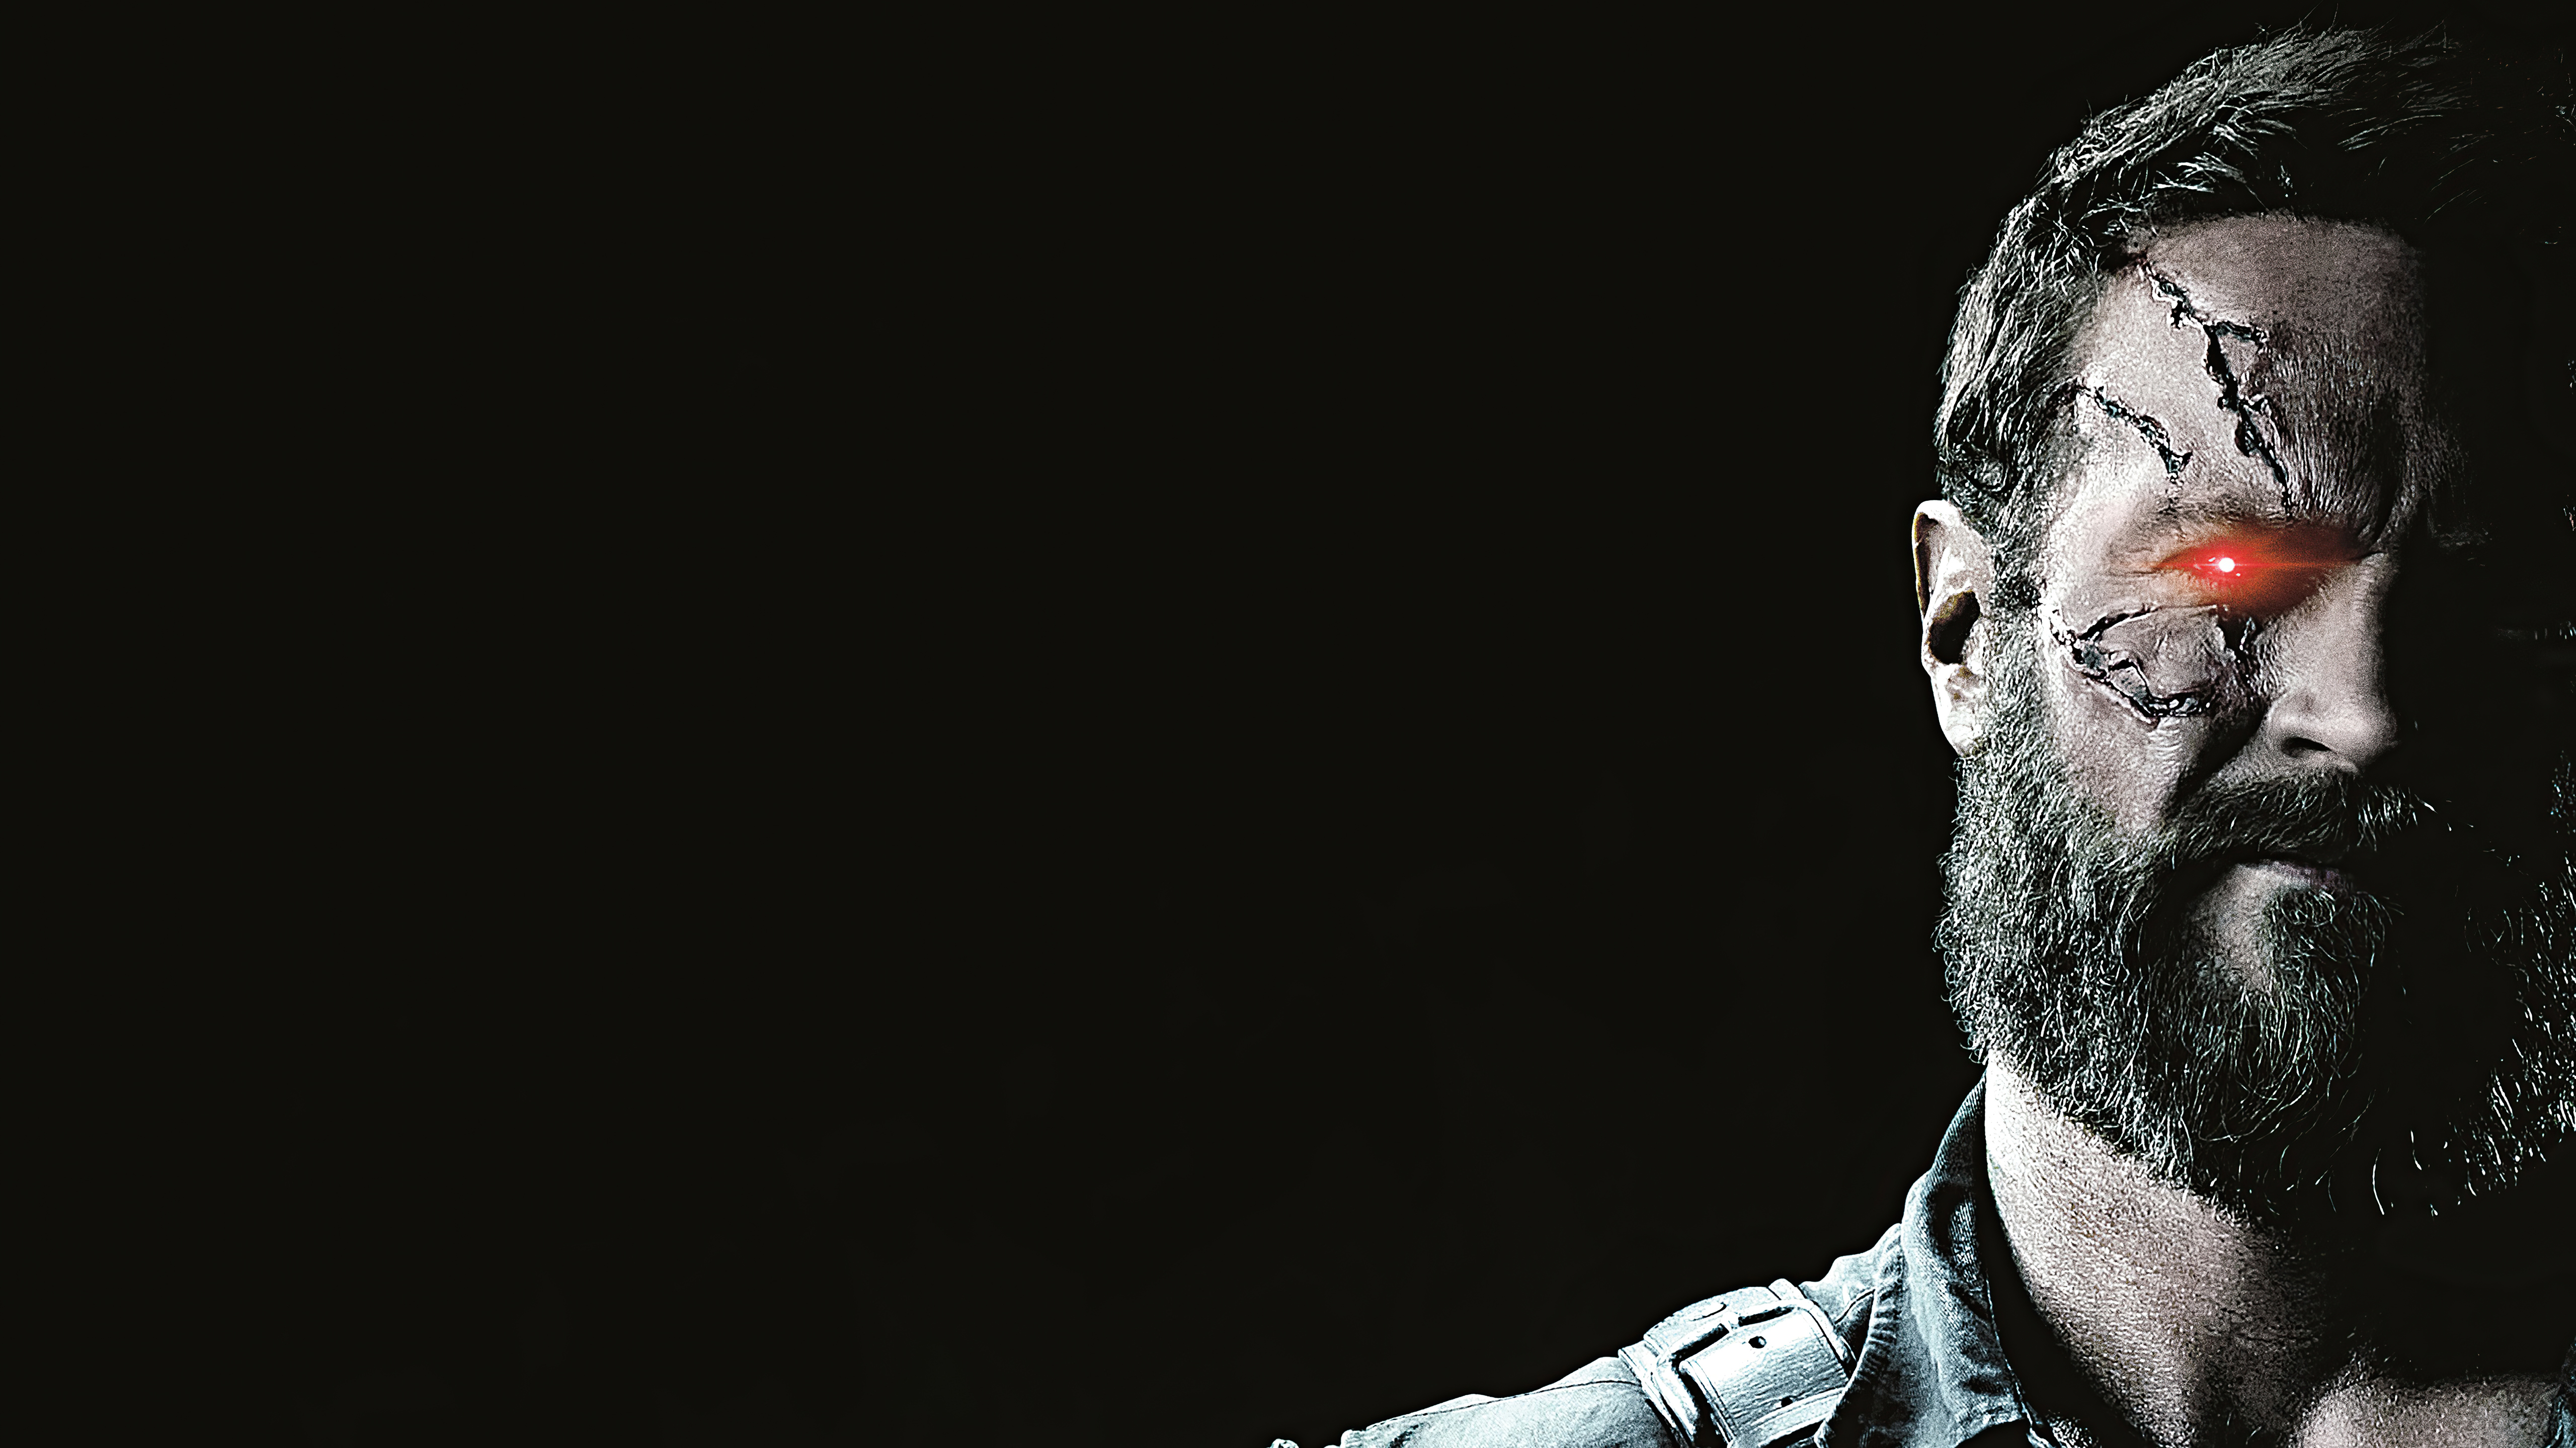 josh lawson as kano mortal kombat movie 4k 1617449215 - Josh Lawson As Kano Mortal Kombat Movie 4k - Josh Lawson As Kano Mortal Kombat Movie 4k wallpapers